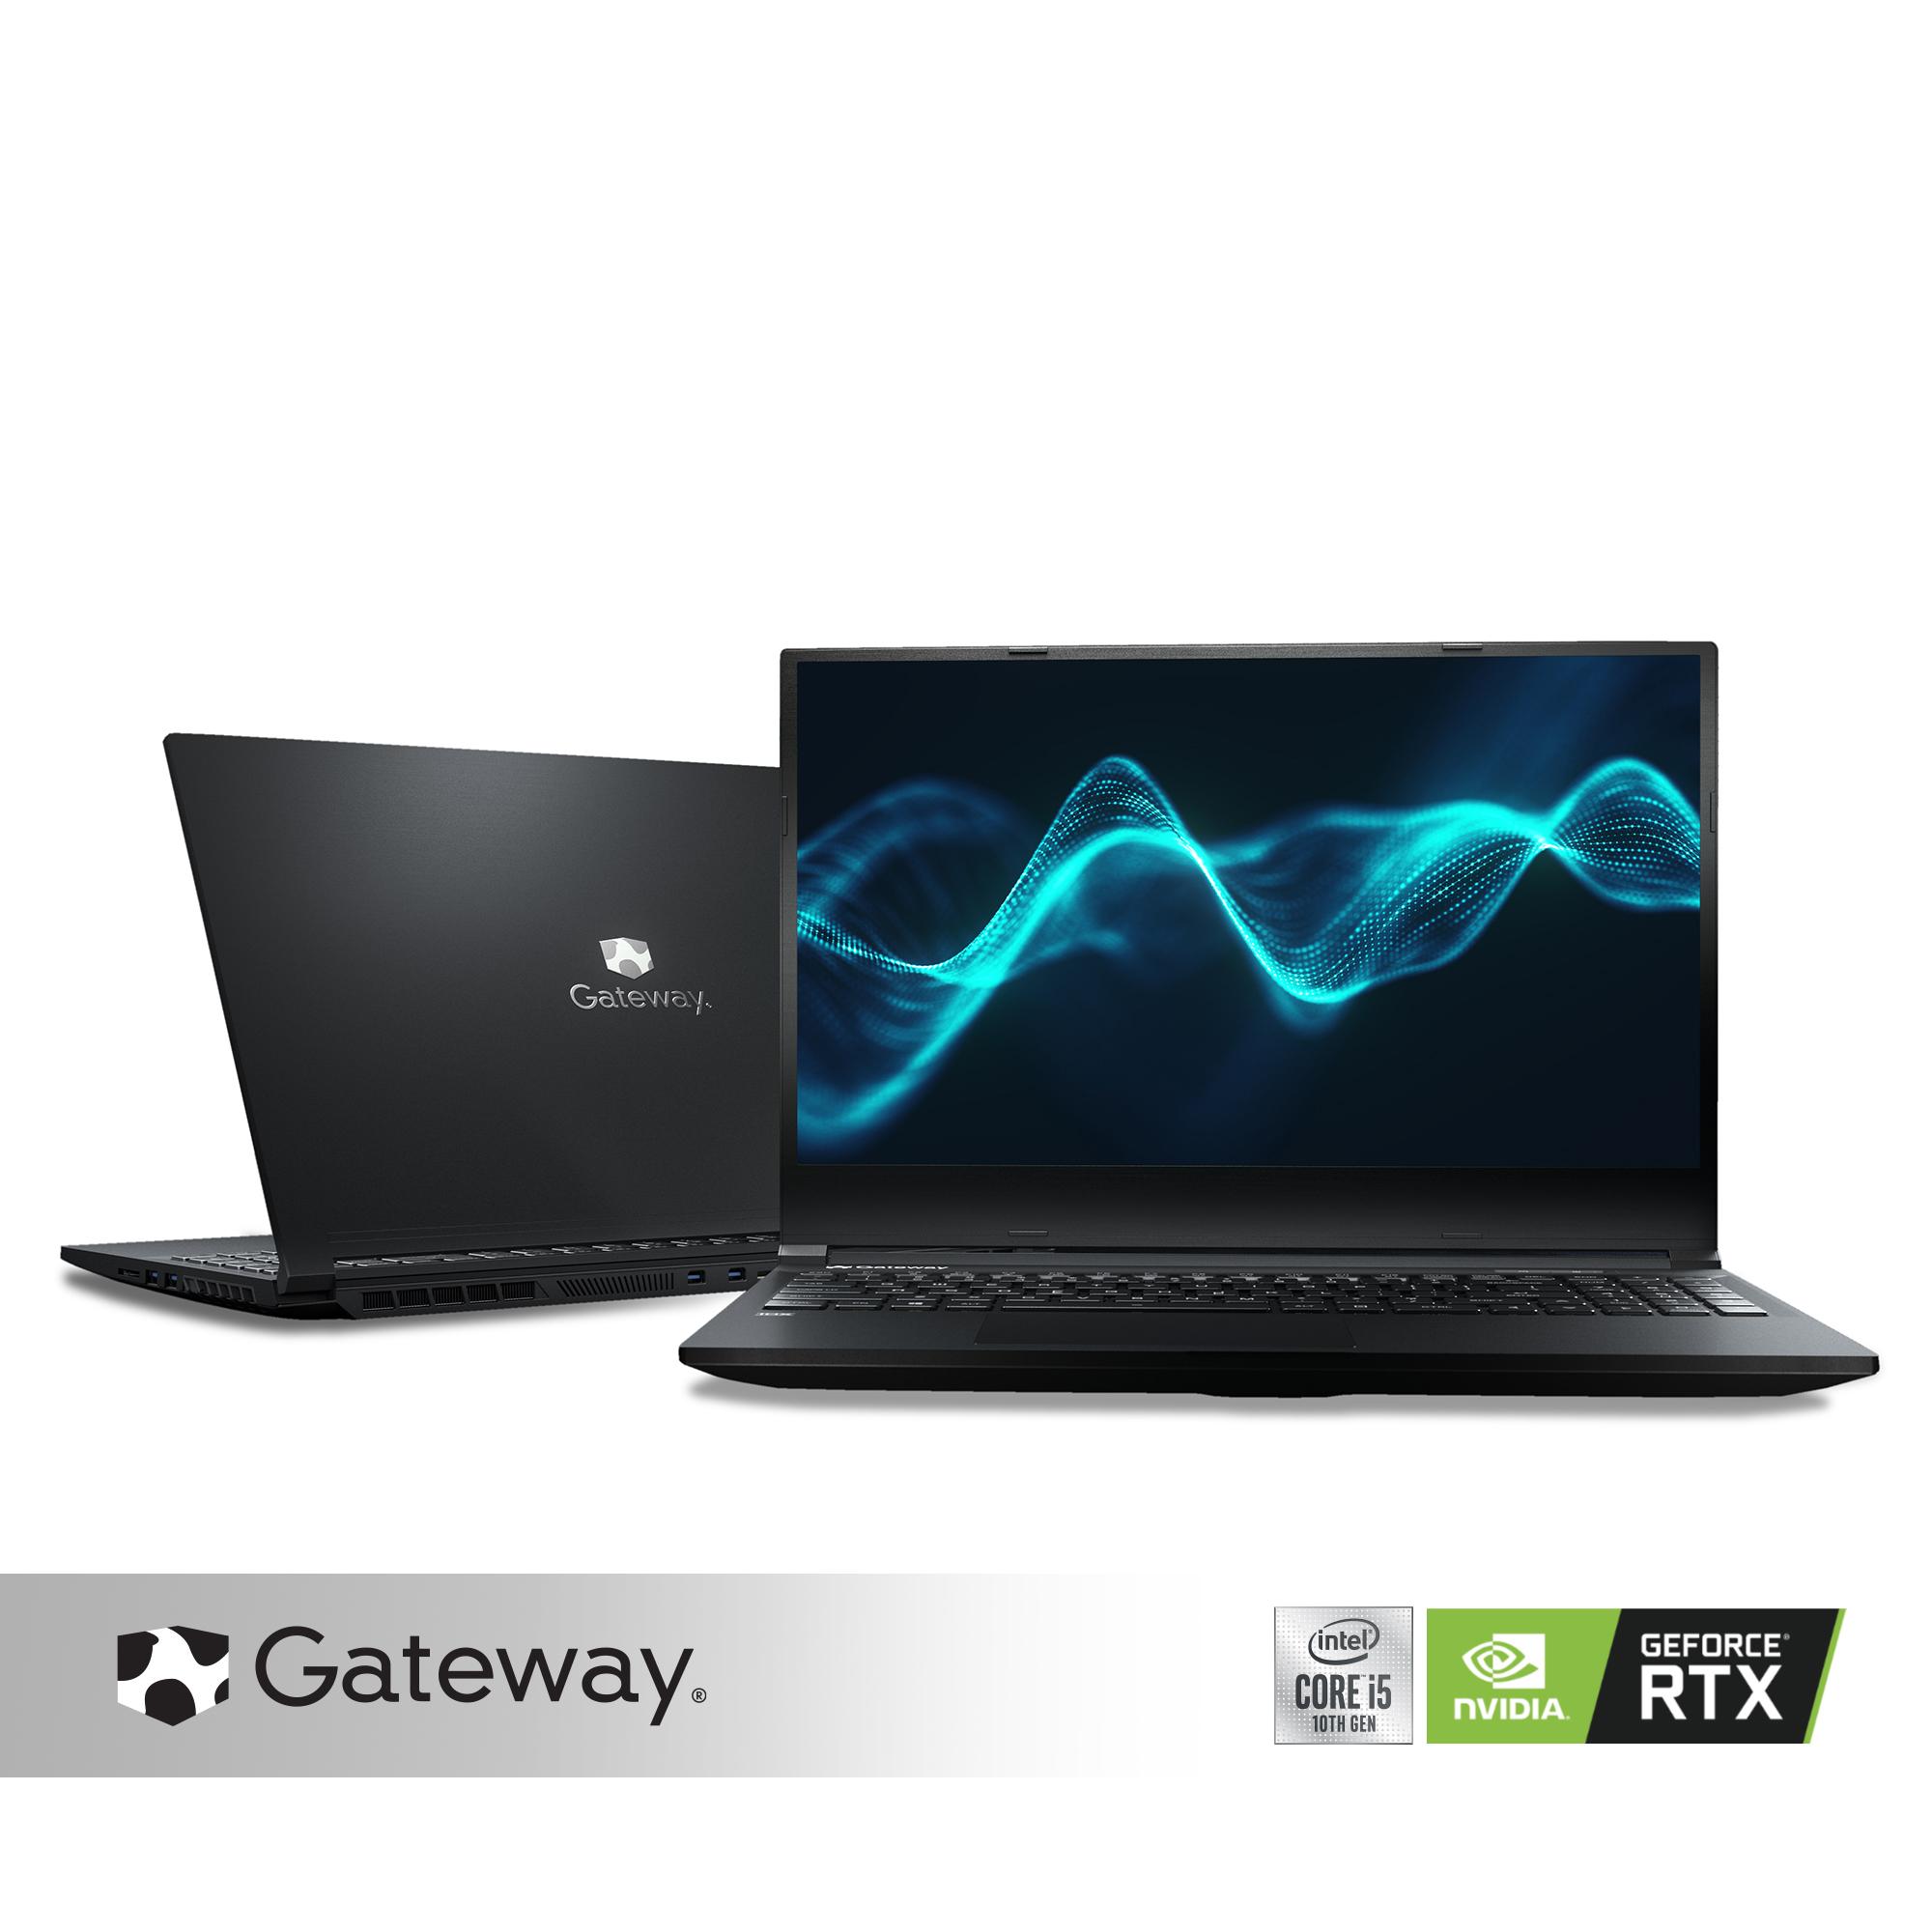 Walmart: Gateway 15.6″ Laptop @ 9.99 + Free Shipping